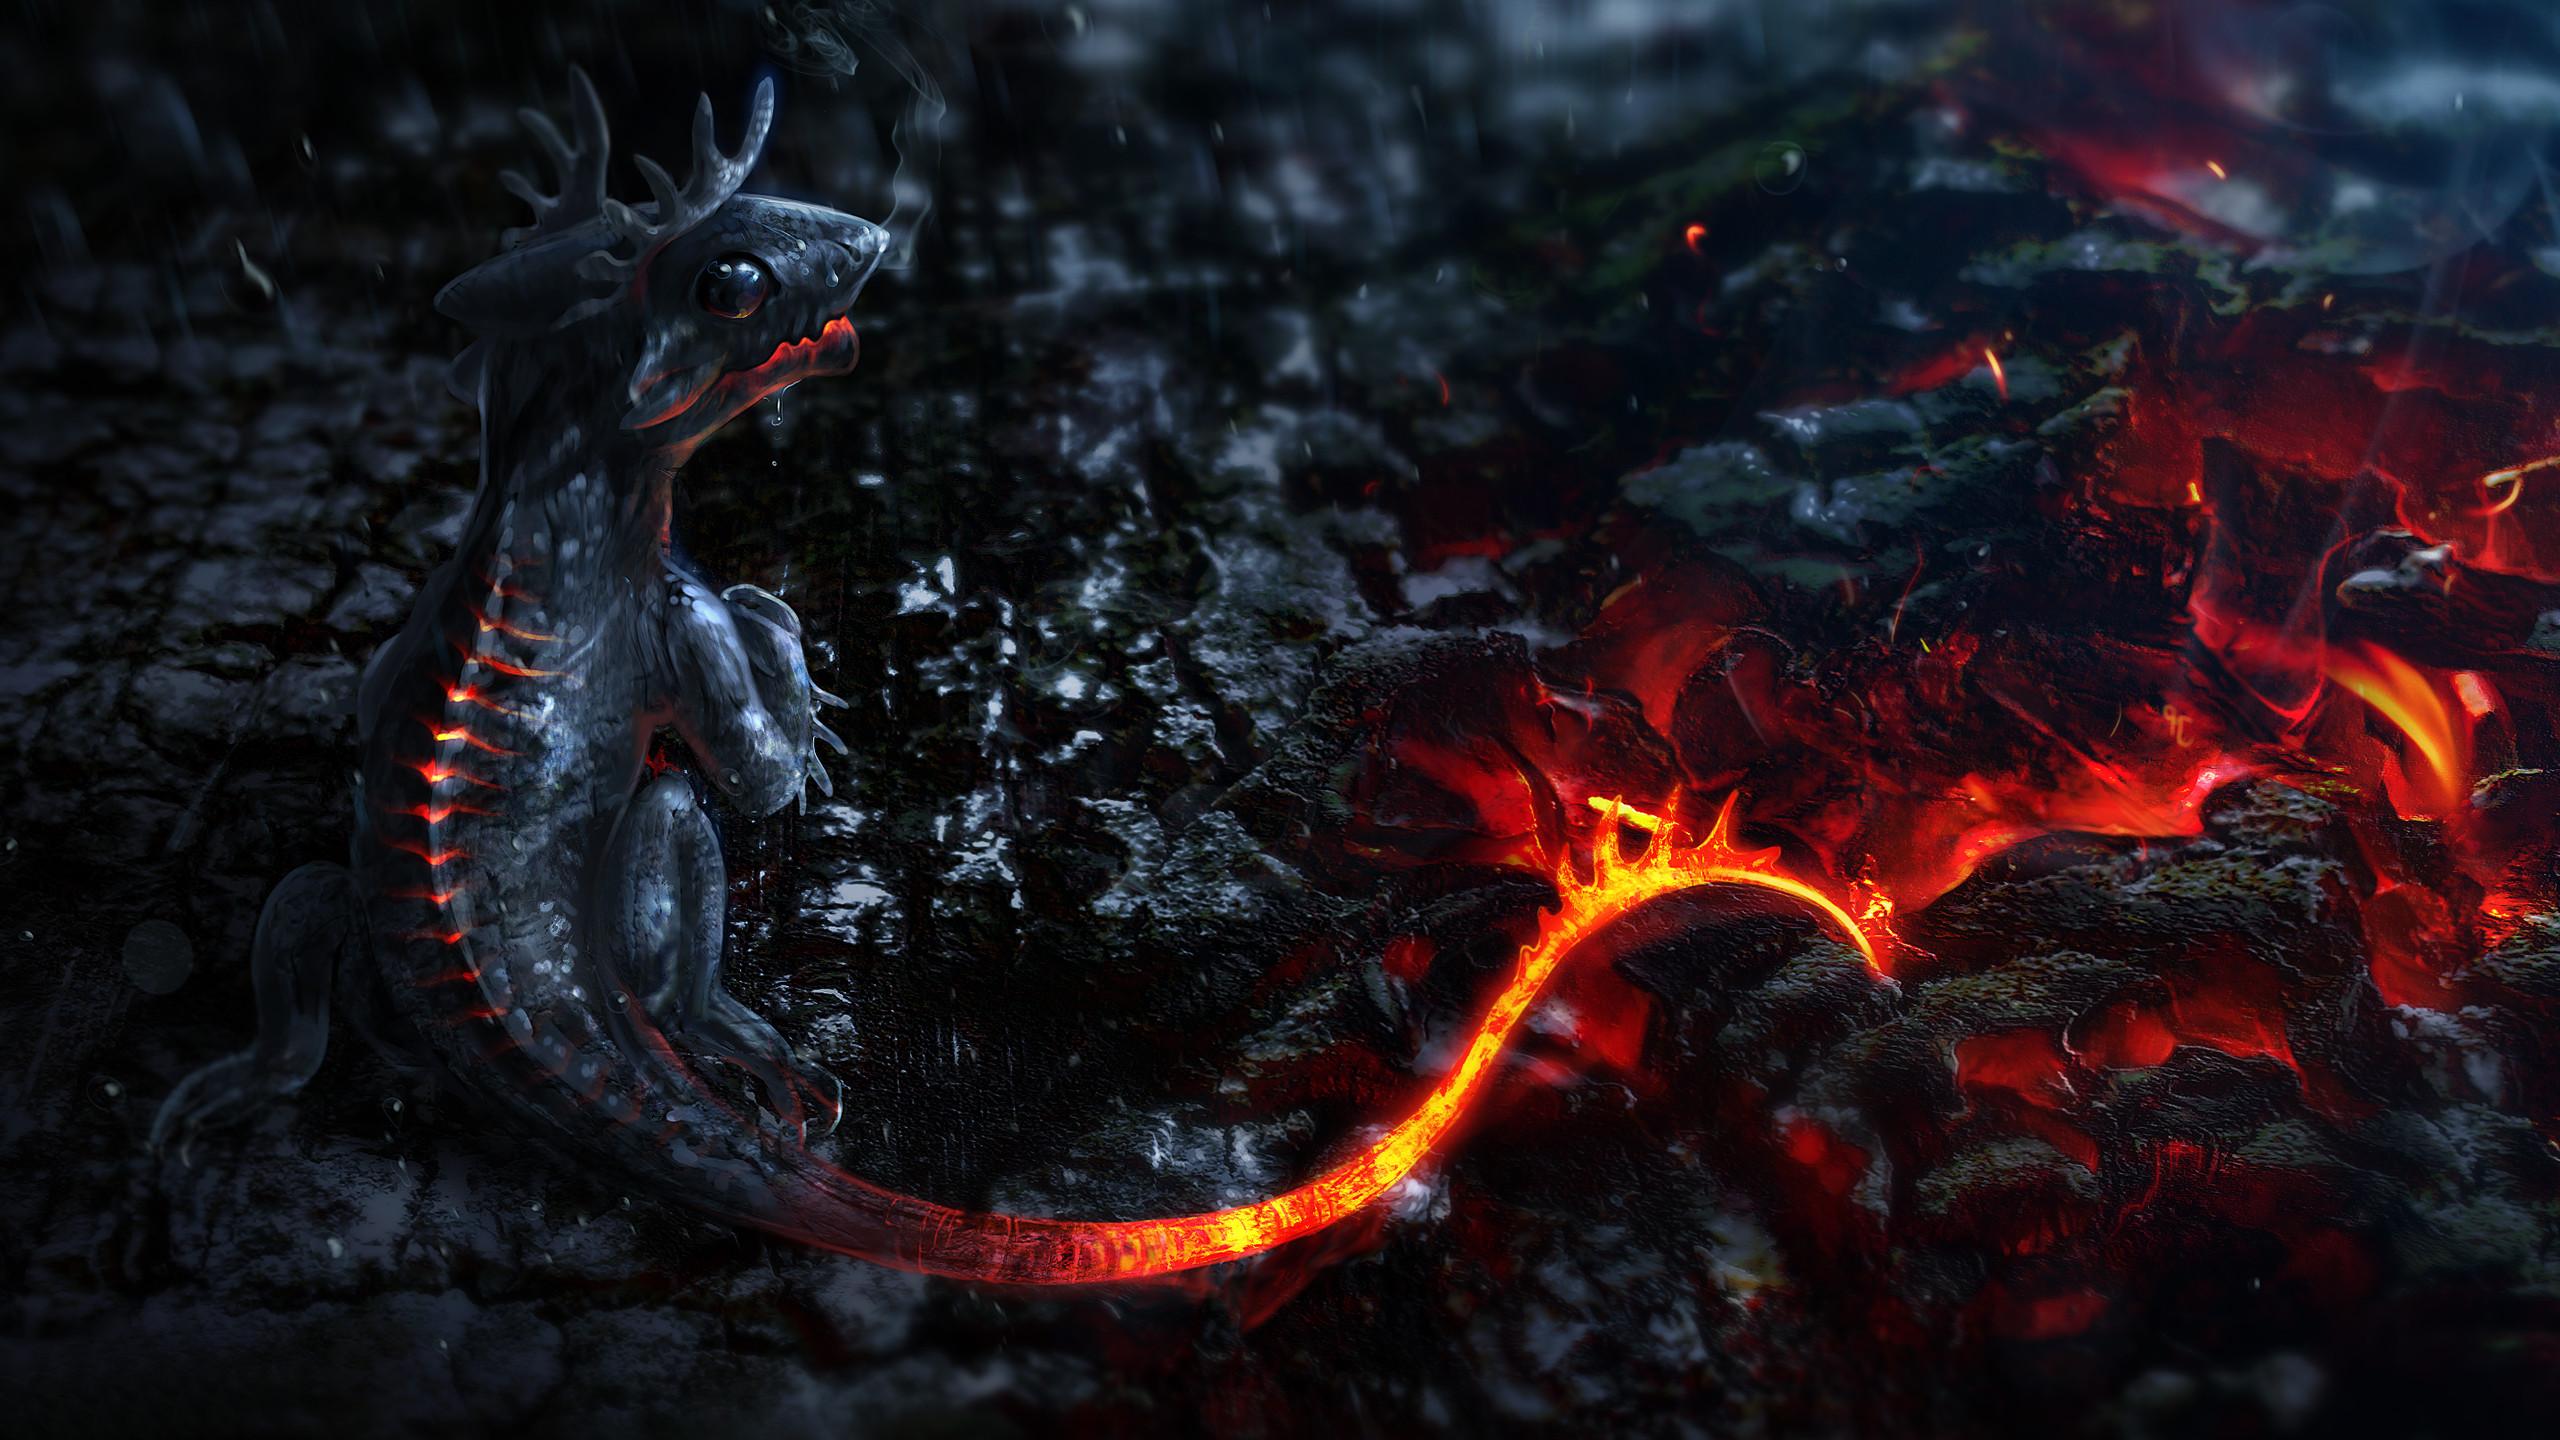 Baby dragon Wallpaper #